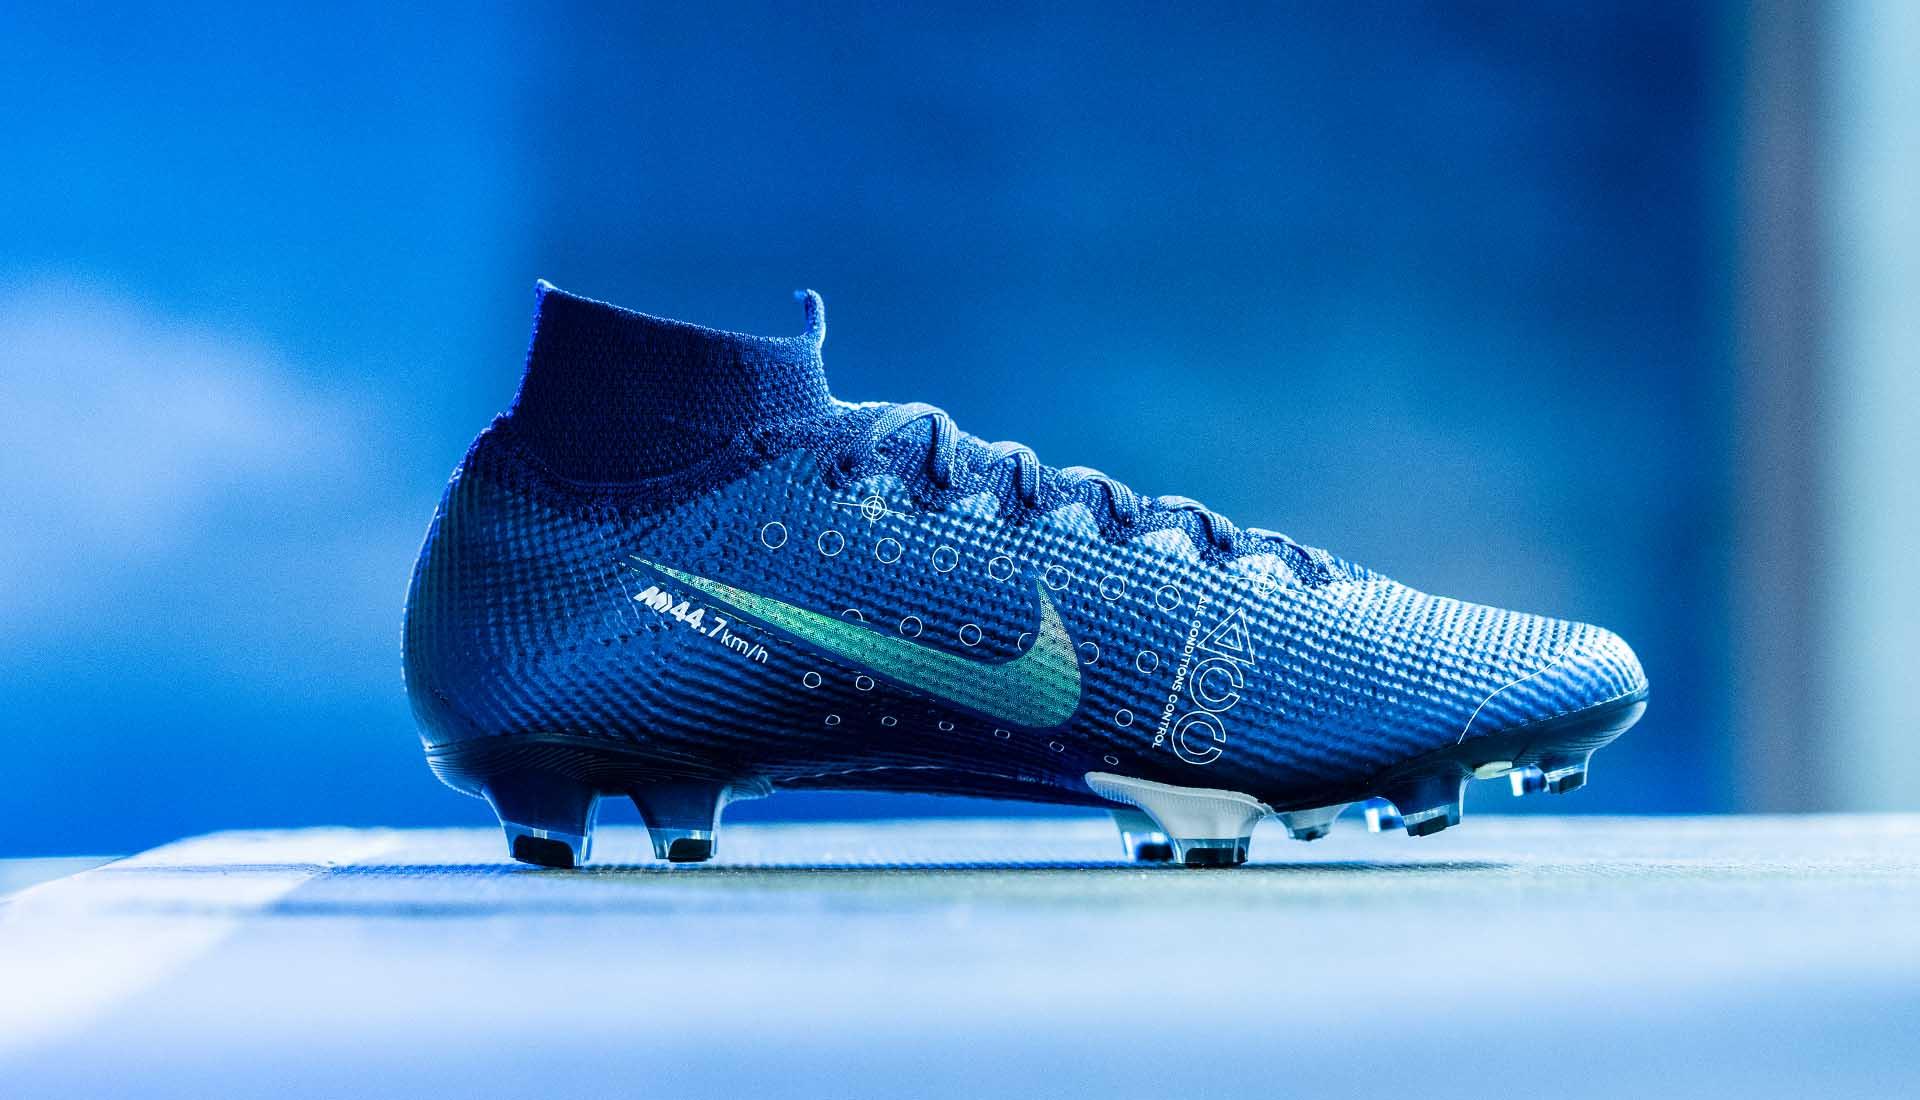 Siêu phẩm Nike Mercurial Dream Speed 2019 2020